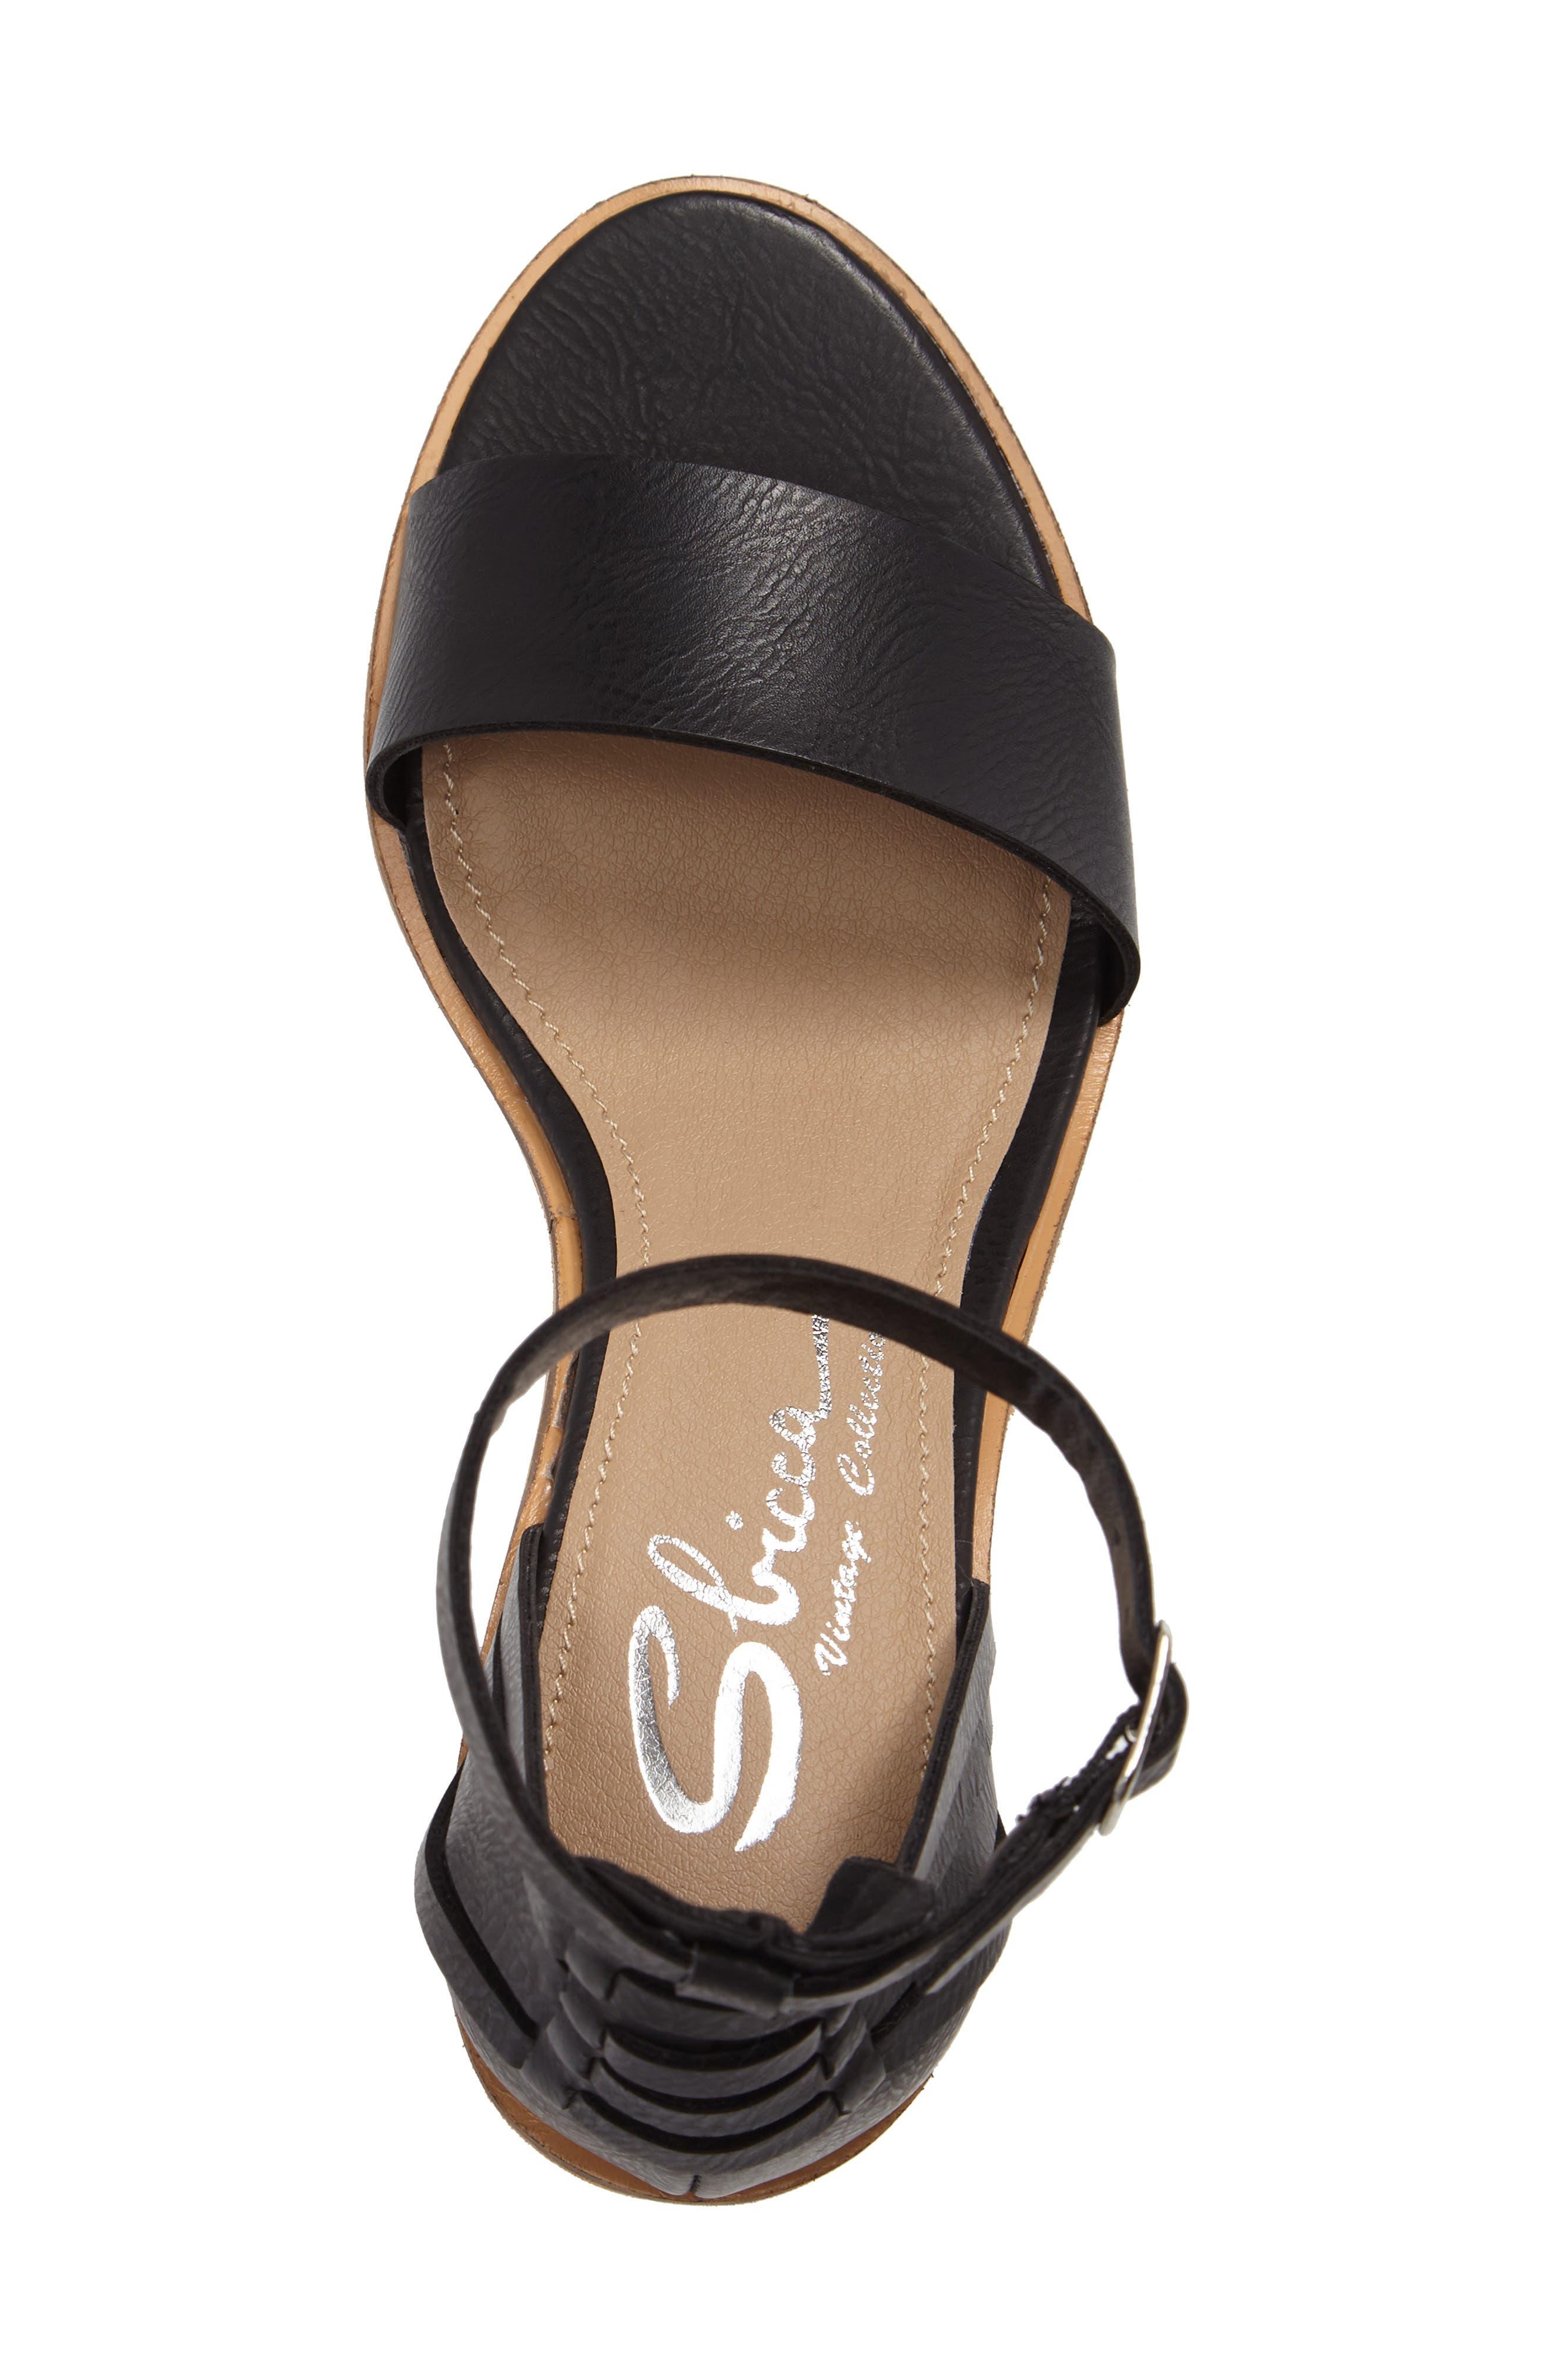 Fars Block Heel Sandal,                             Alternate thumbnail 5, color,                             001